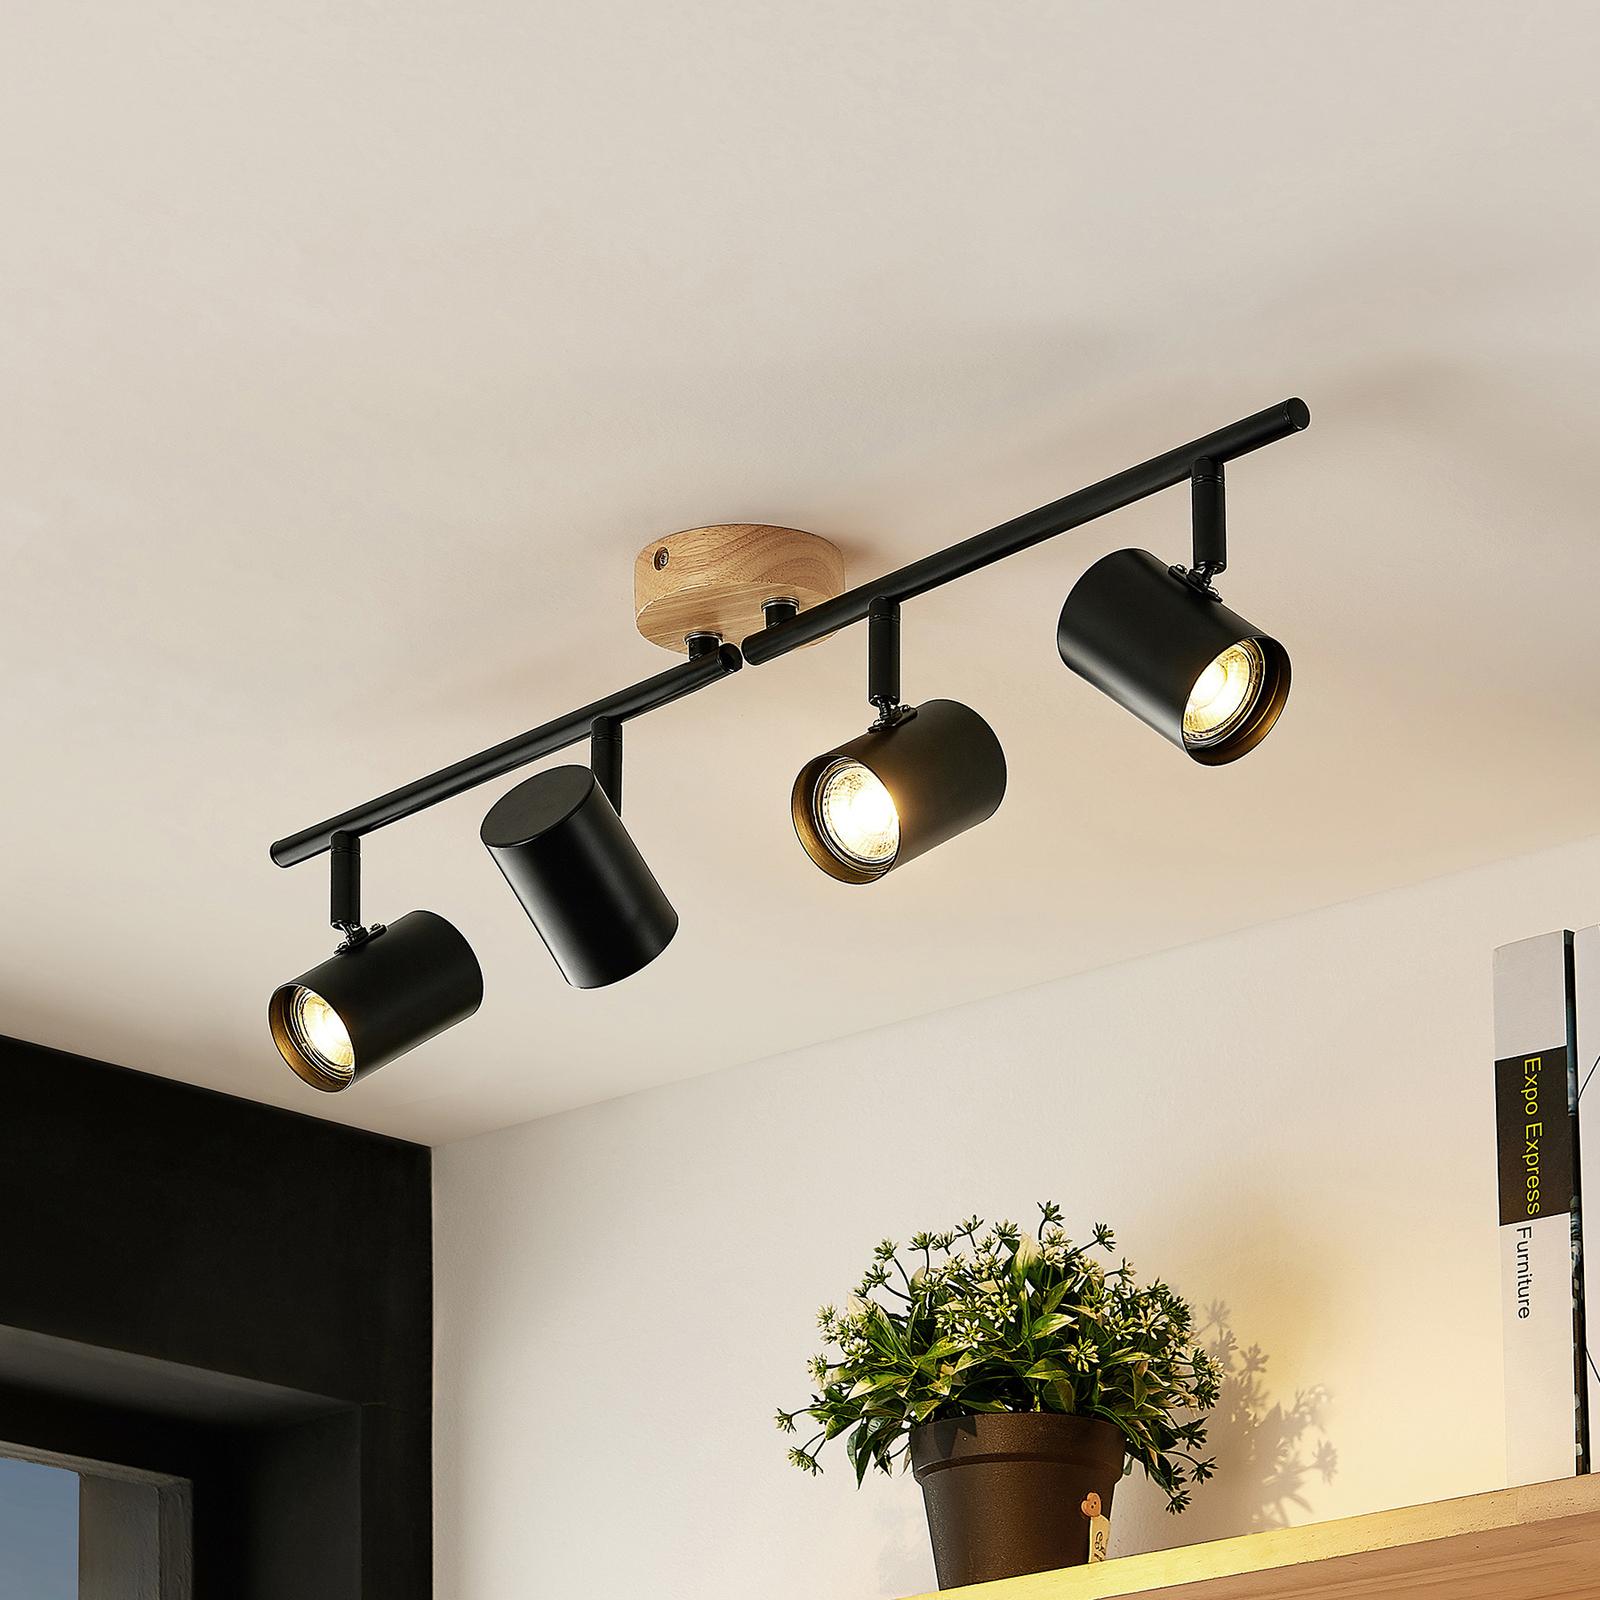 Lindby Xiomara LED-Deckenleuchte, vierflammig